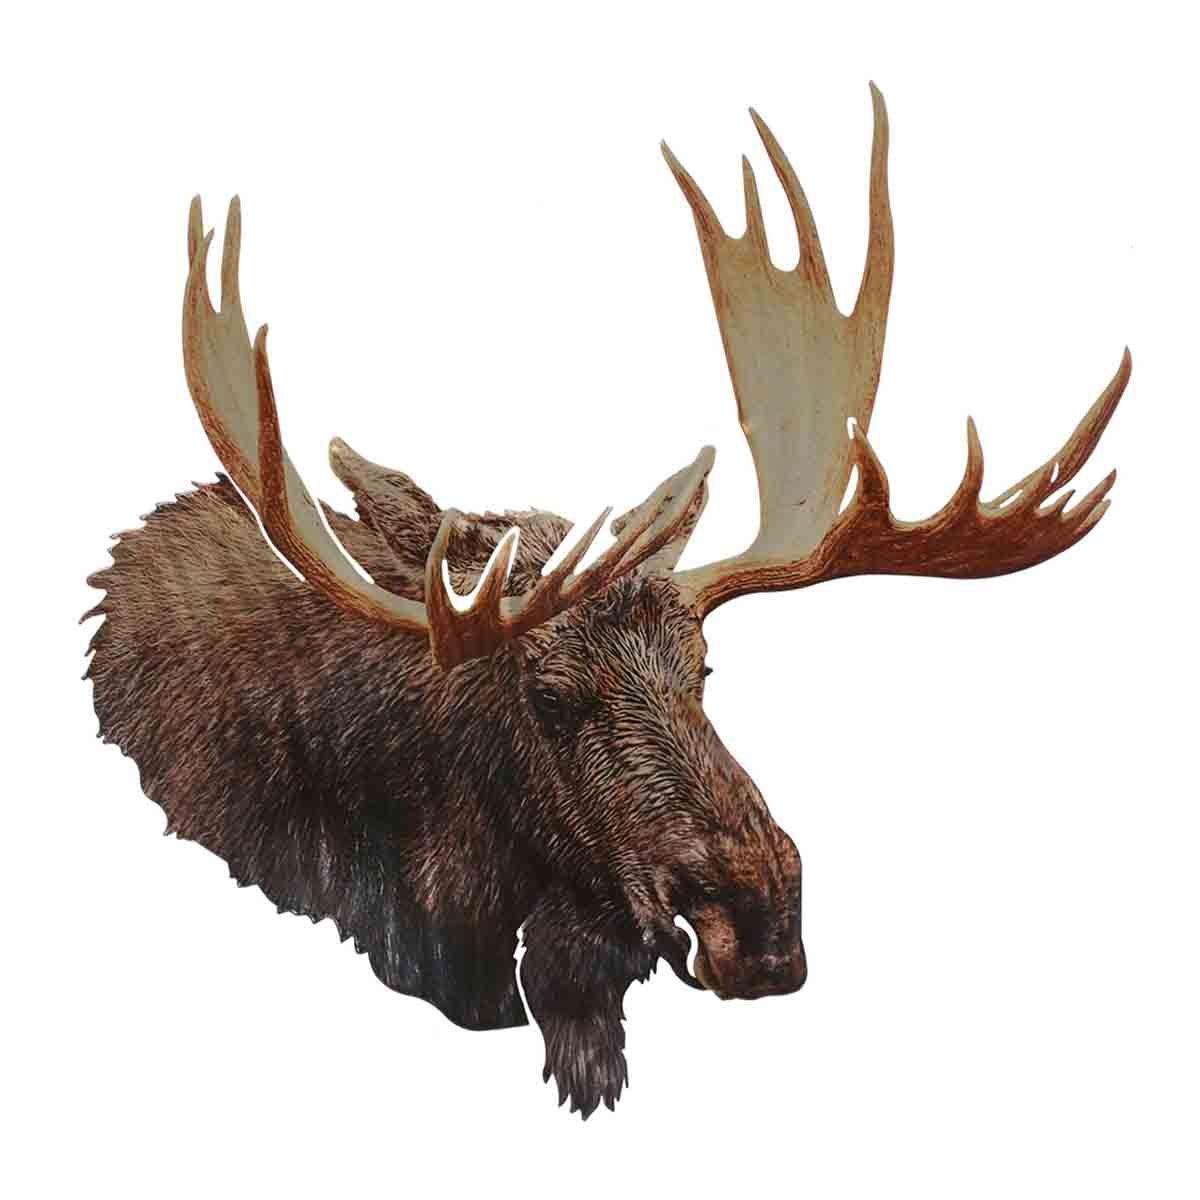 Amazon.com: Moose Head Metal Wall Art: Home & Kitchen